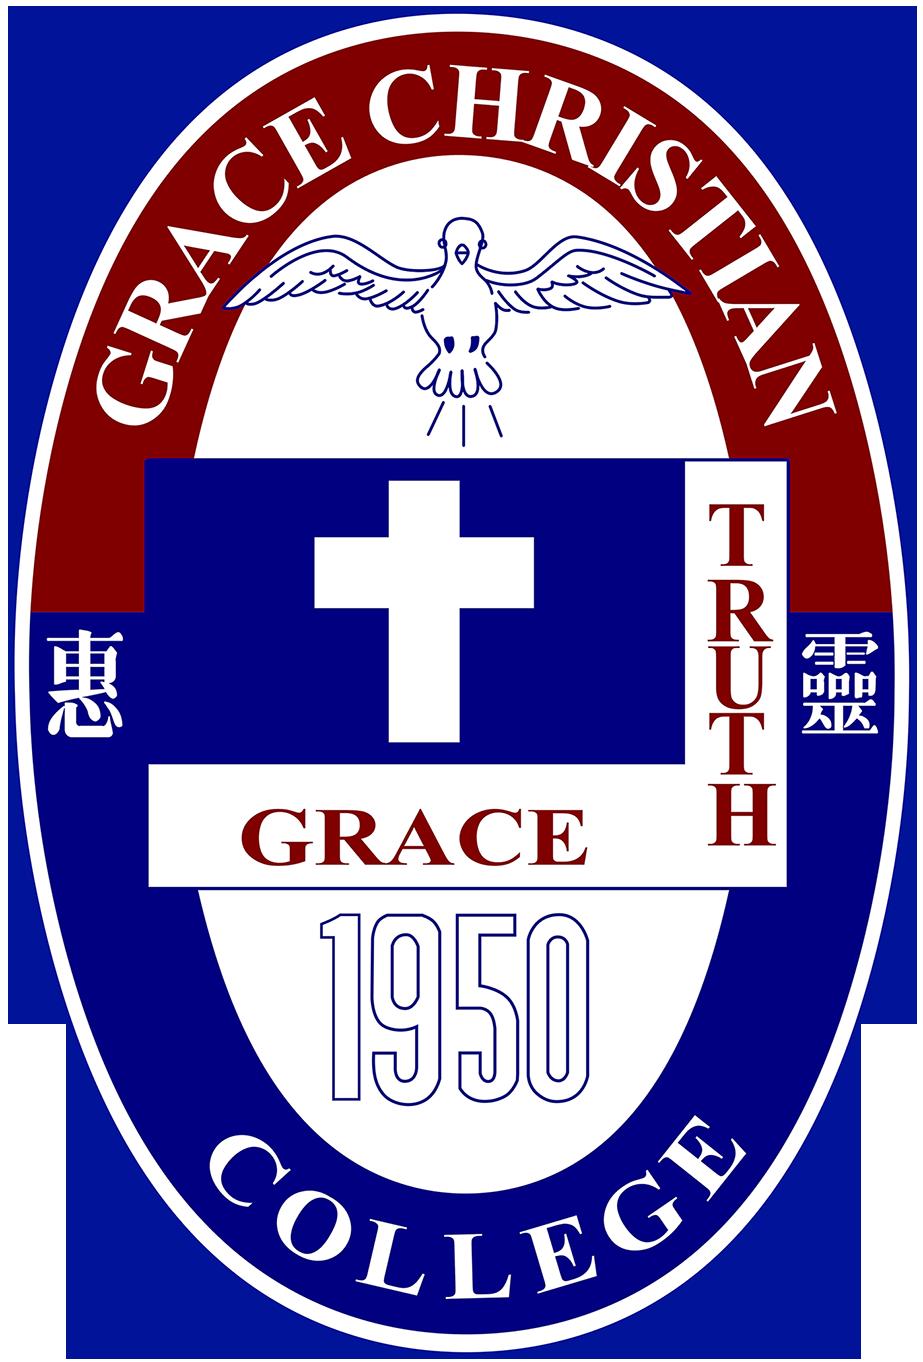 Grace Christian College logo